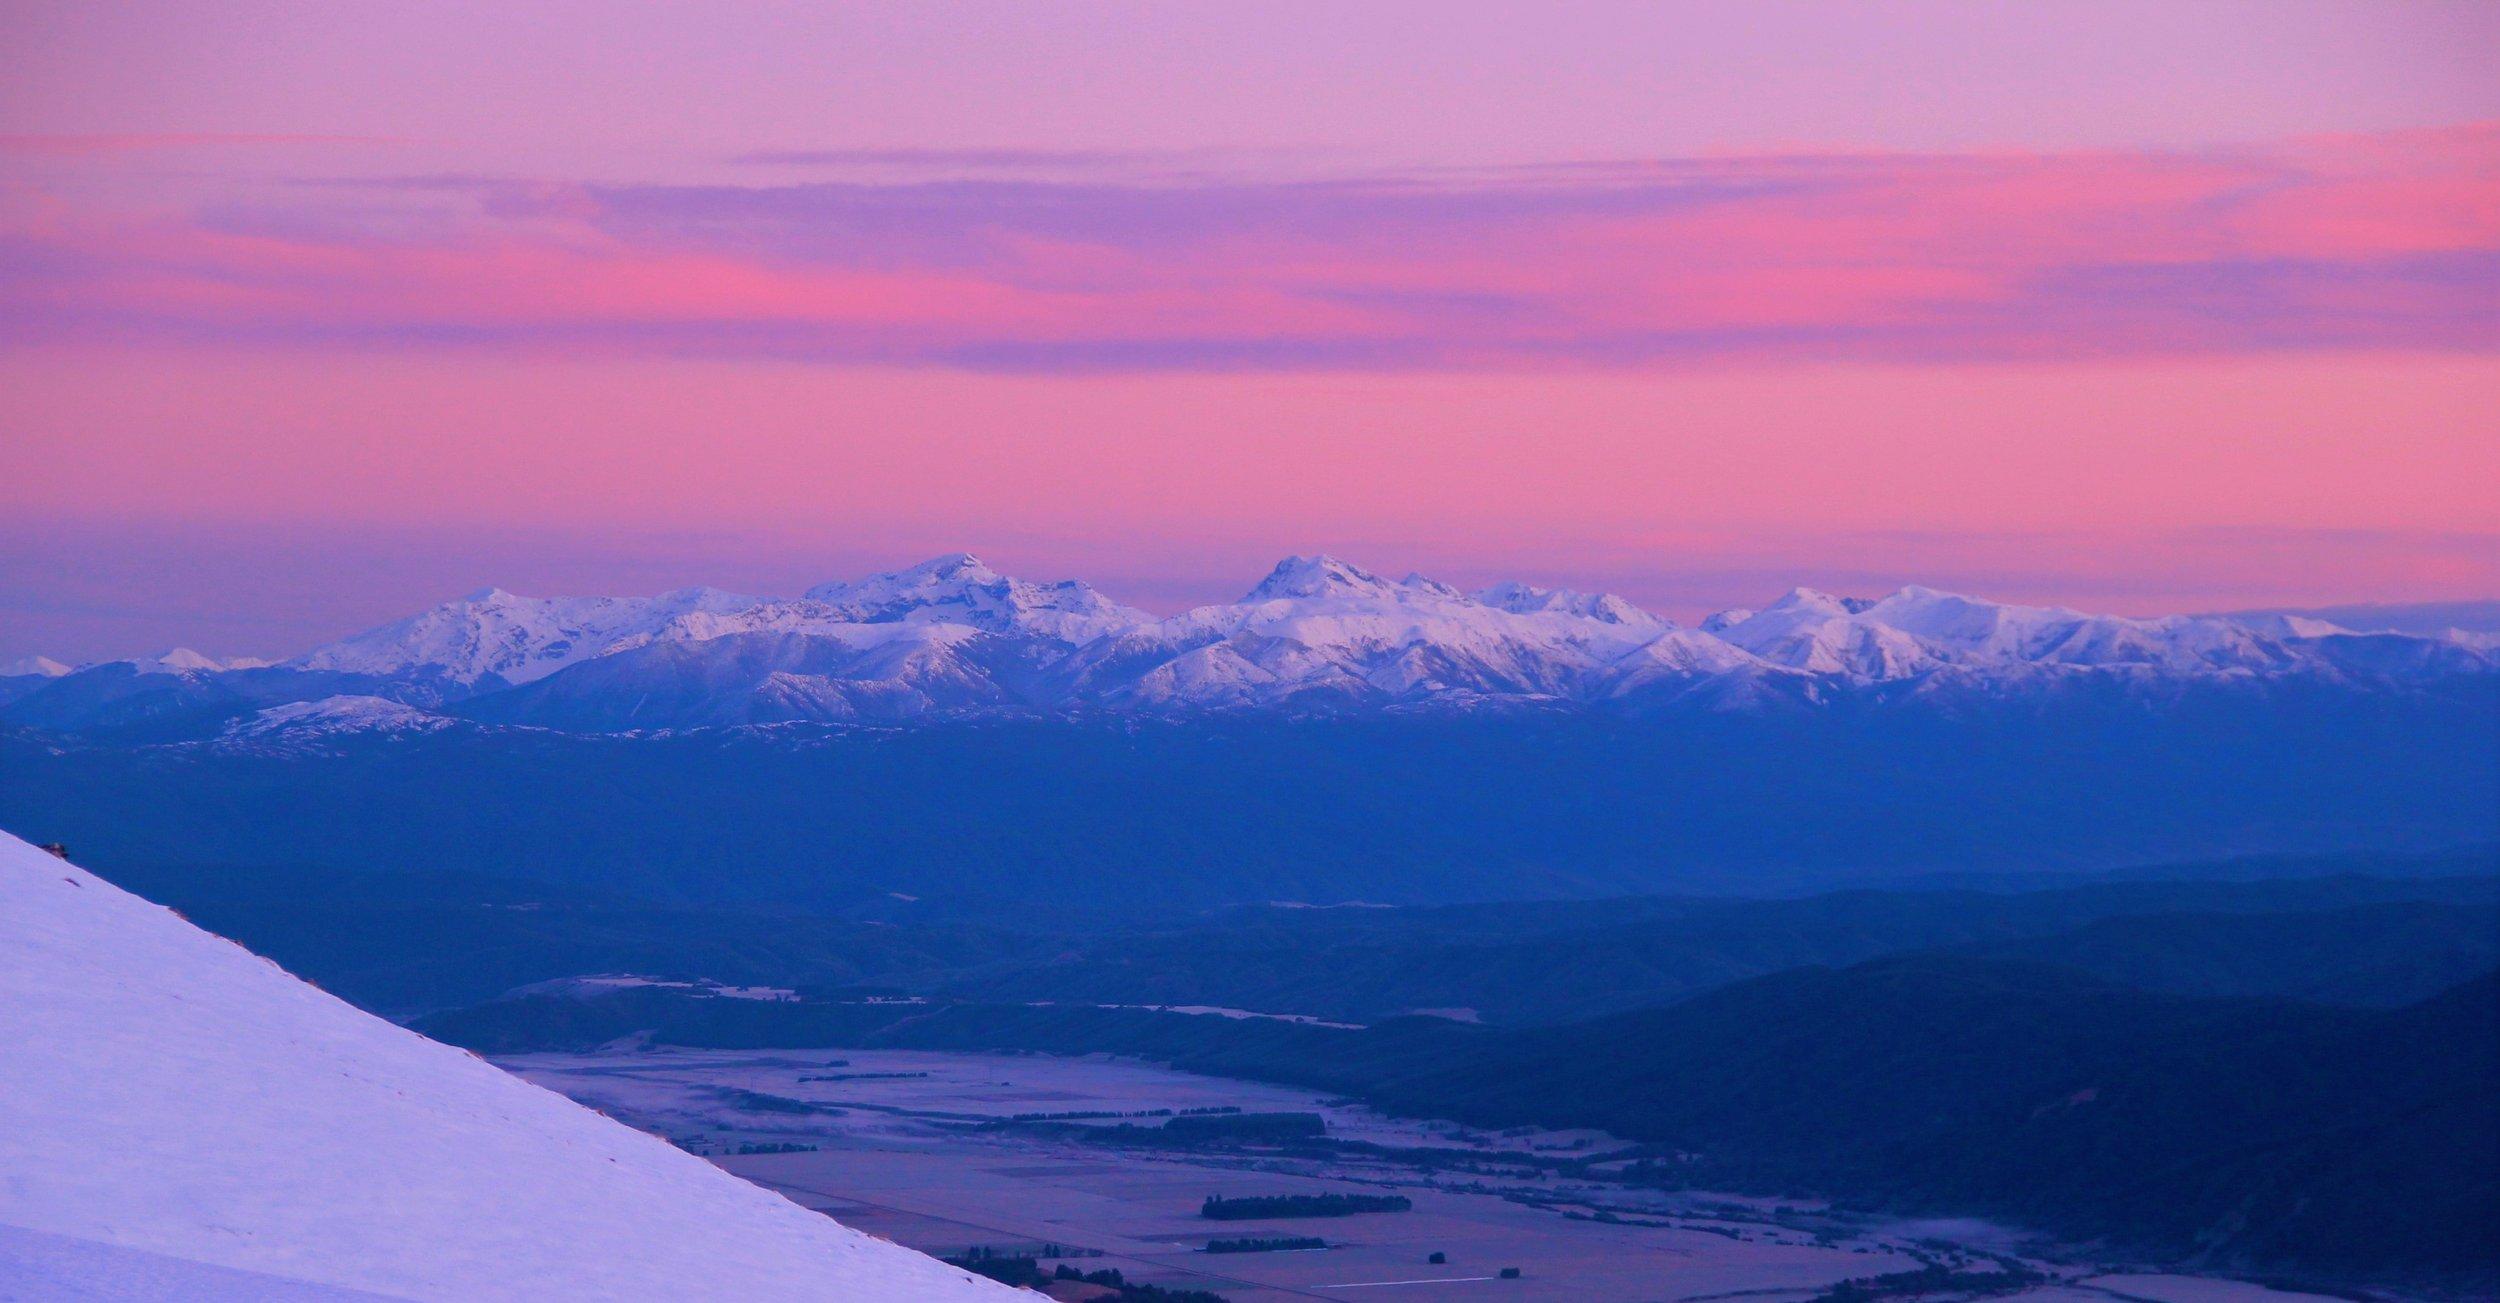 Mount Owen Massif at Dawn from Bushline hut.